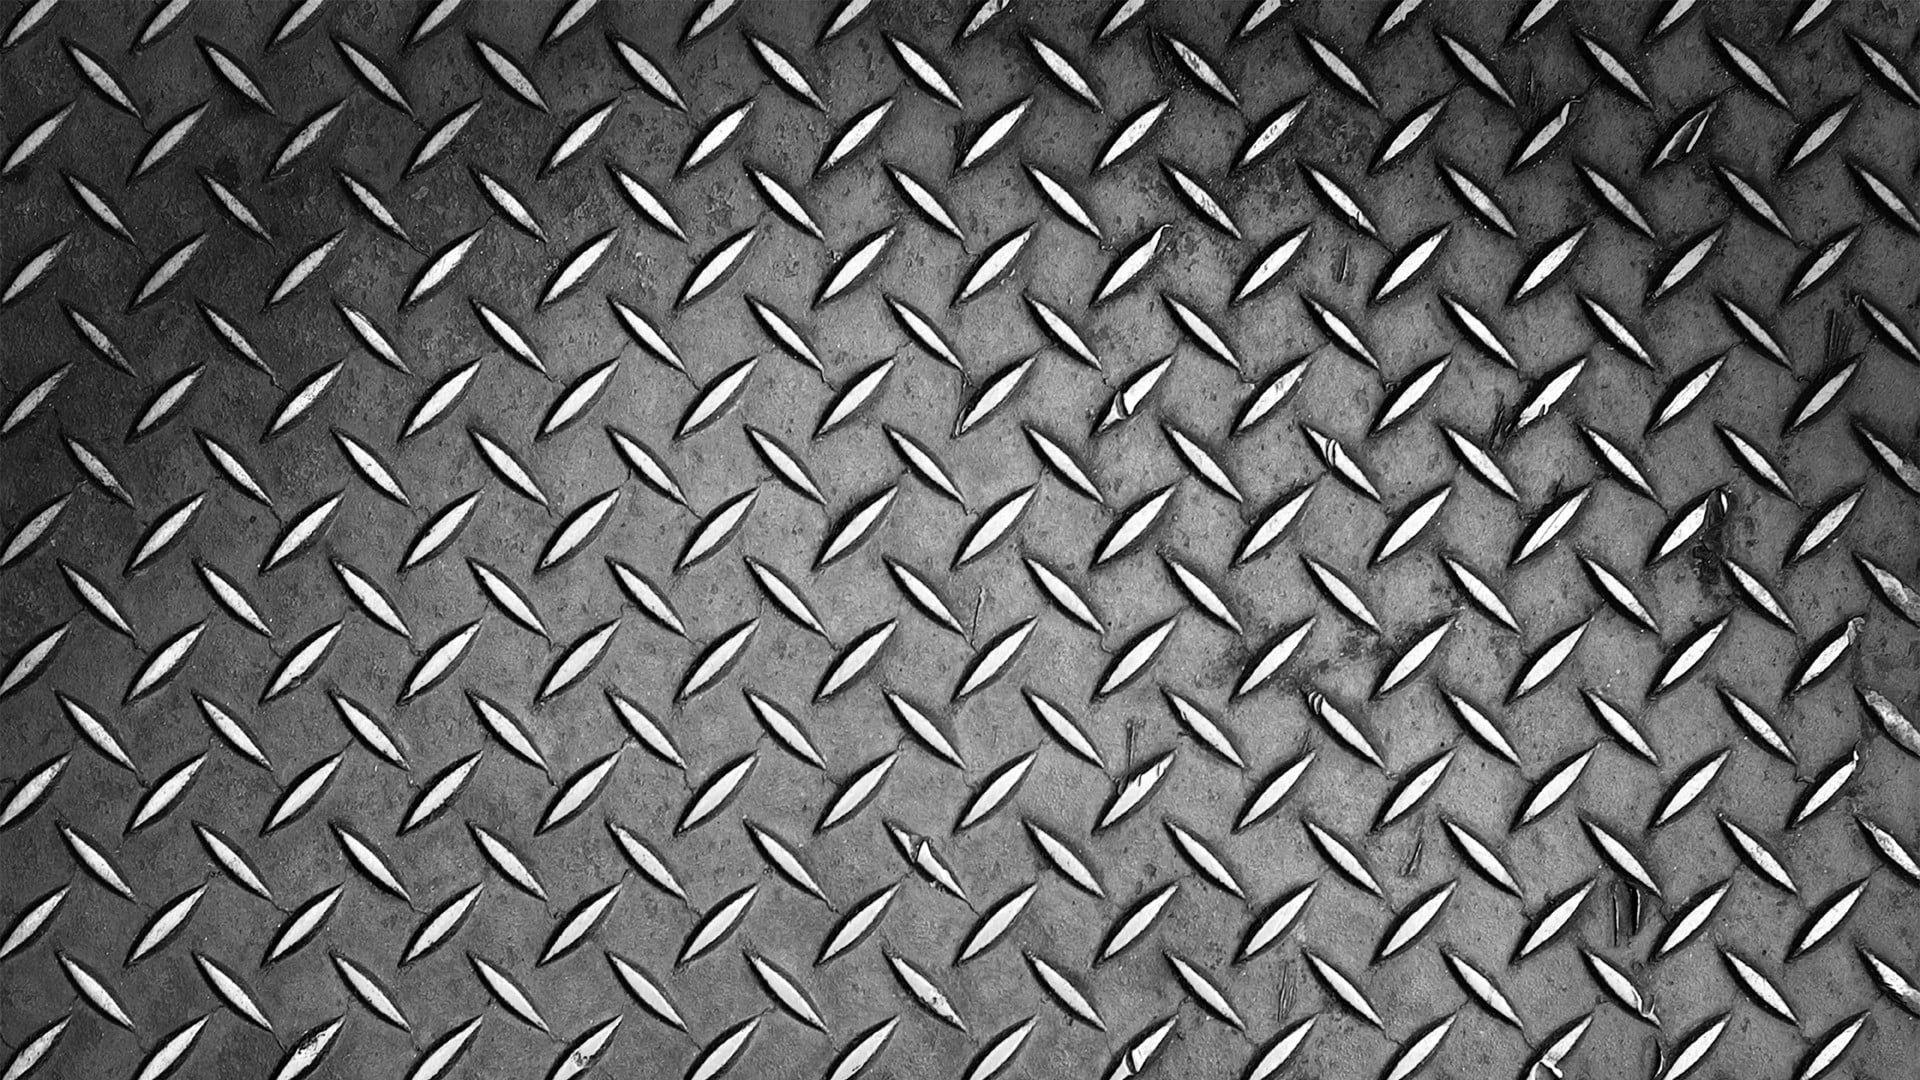 Grey Steel Panel Pattern 1080p Wallpaper Hdwallpaper Desktop World Wallpaper Black And Blue Wallpaper Grey Floral Wallpaper